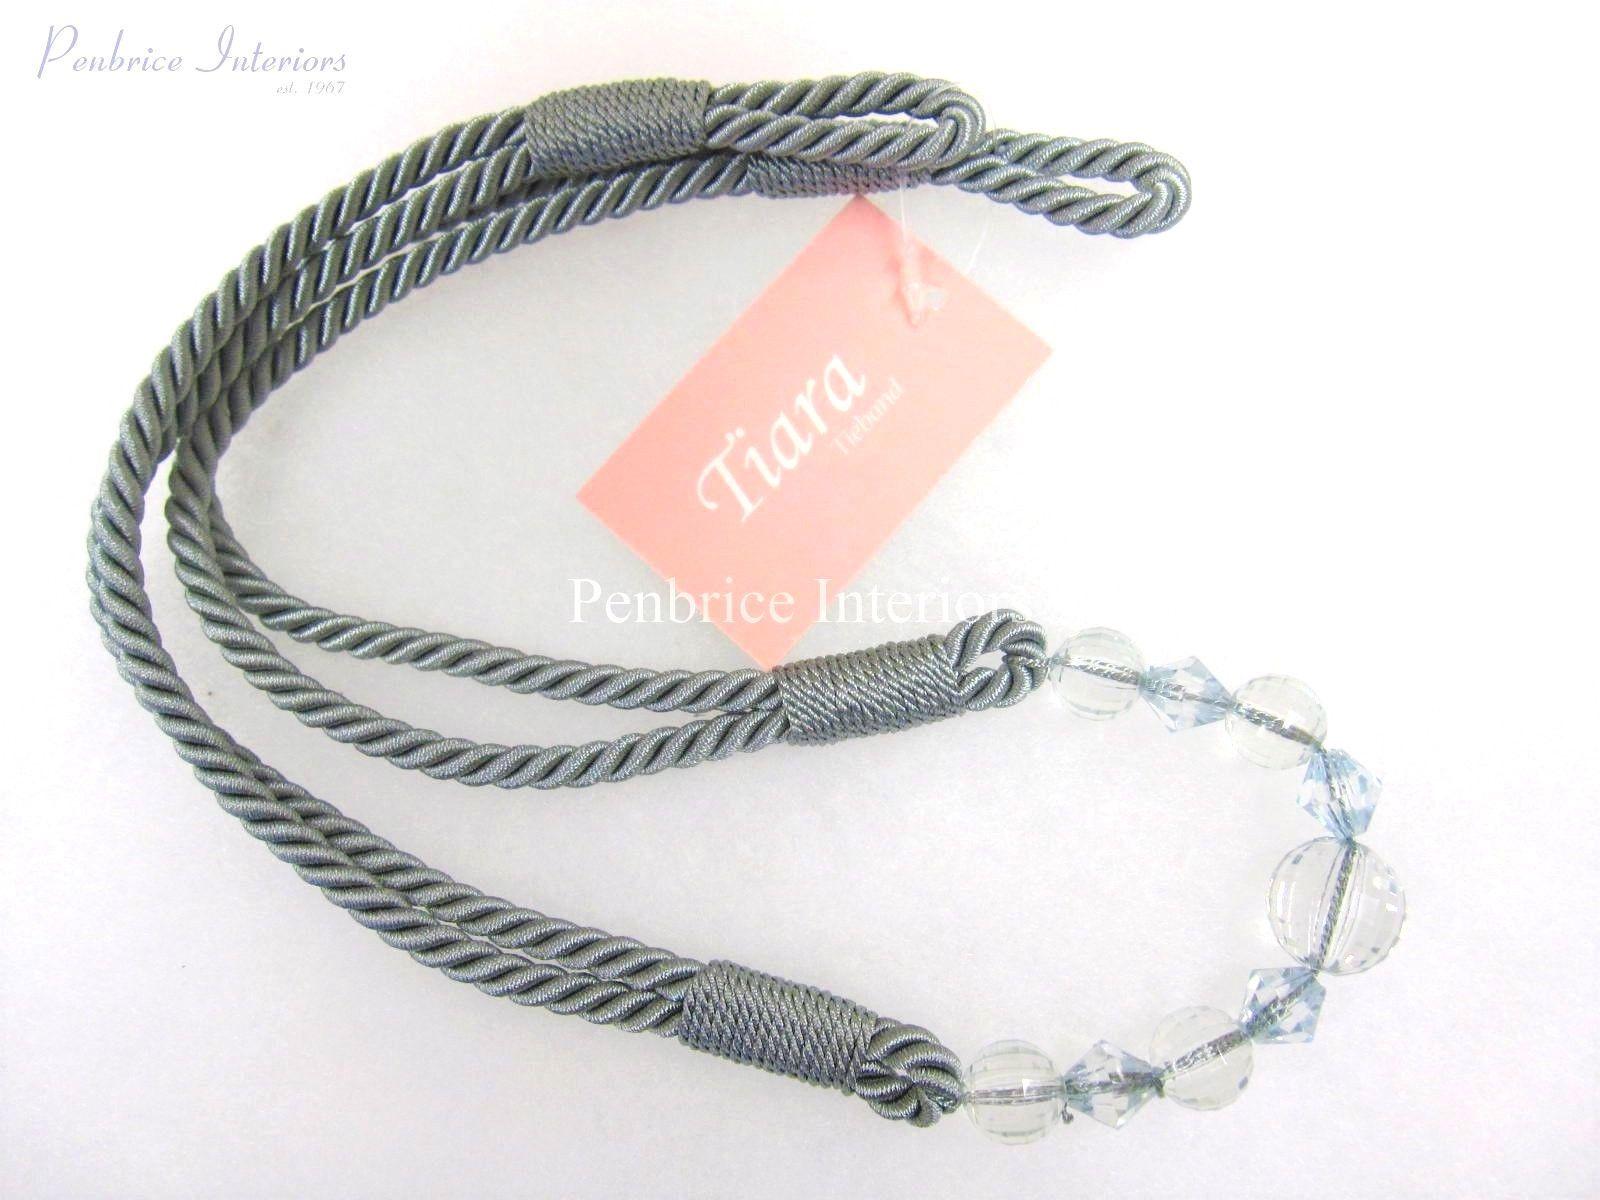 Tiara Curtain Rope Tieback - 78cm - Clear bead Style Tie Back 6 ...